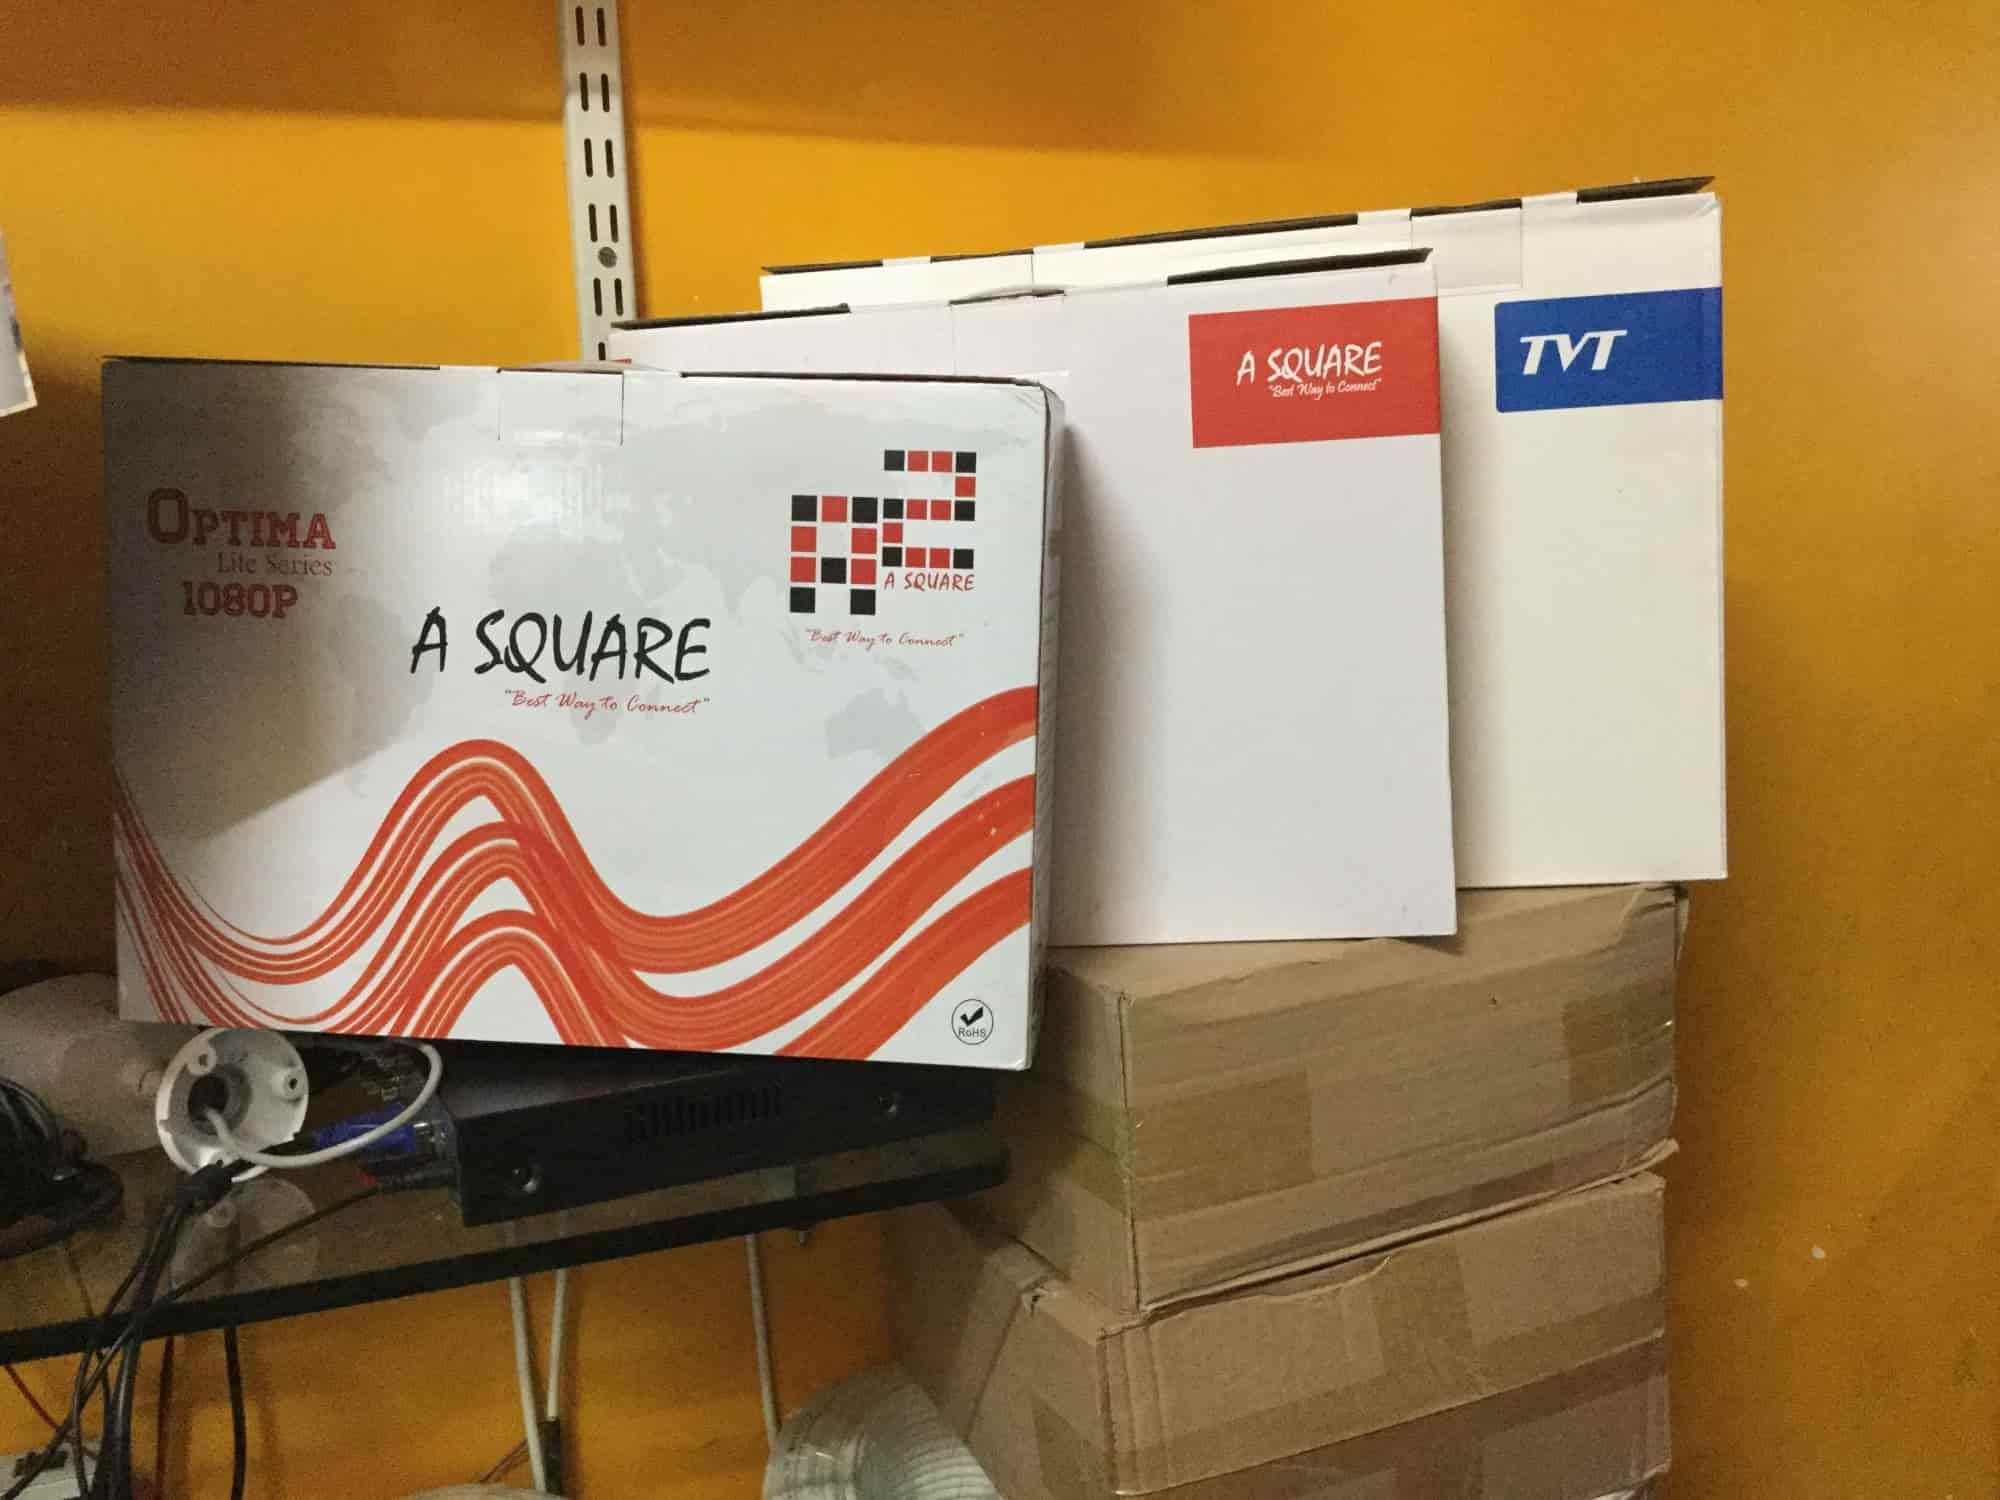 Asquare TVT CCTV Cables HDMI VGA, Koti - CCTV Dealers in Hyderabad